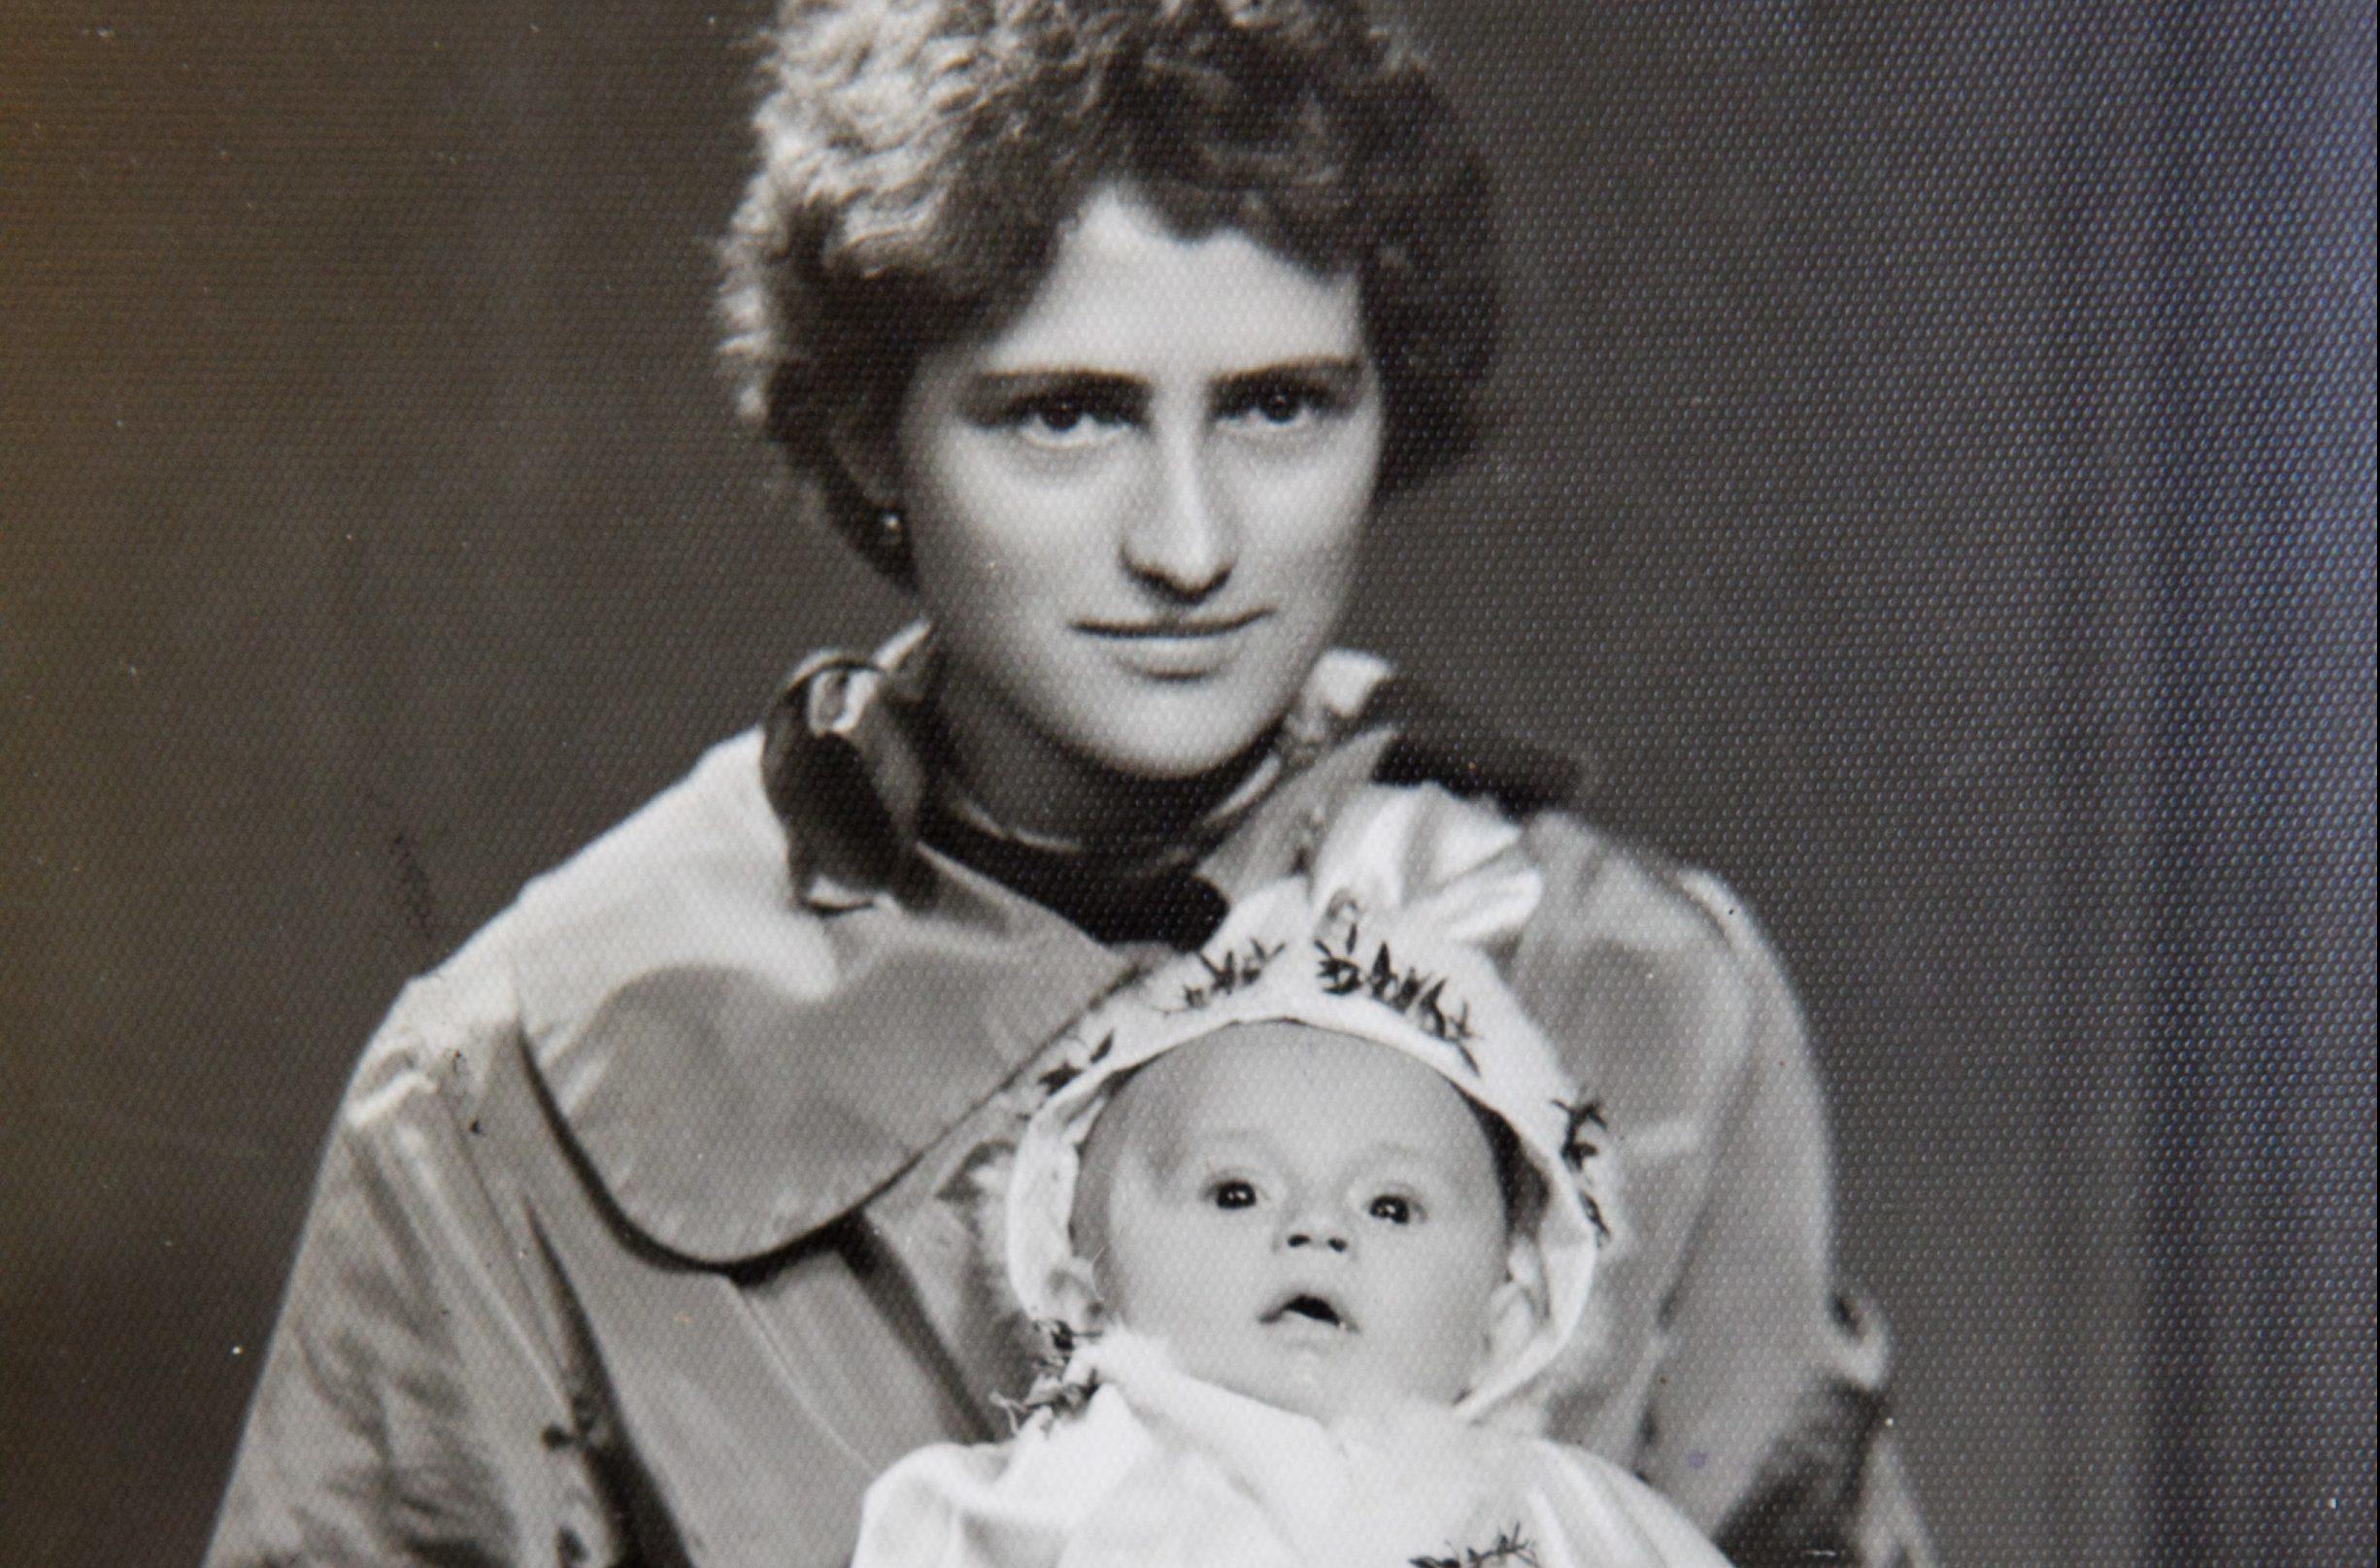 Bronislawa Jakubska with daughter Basia